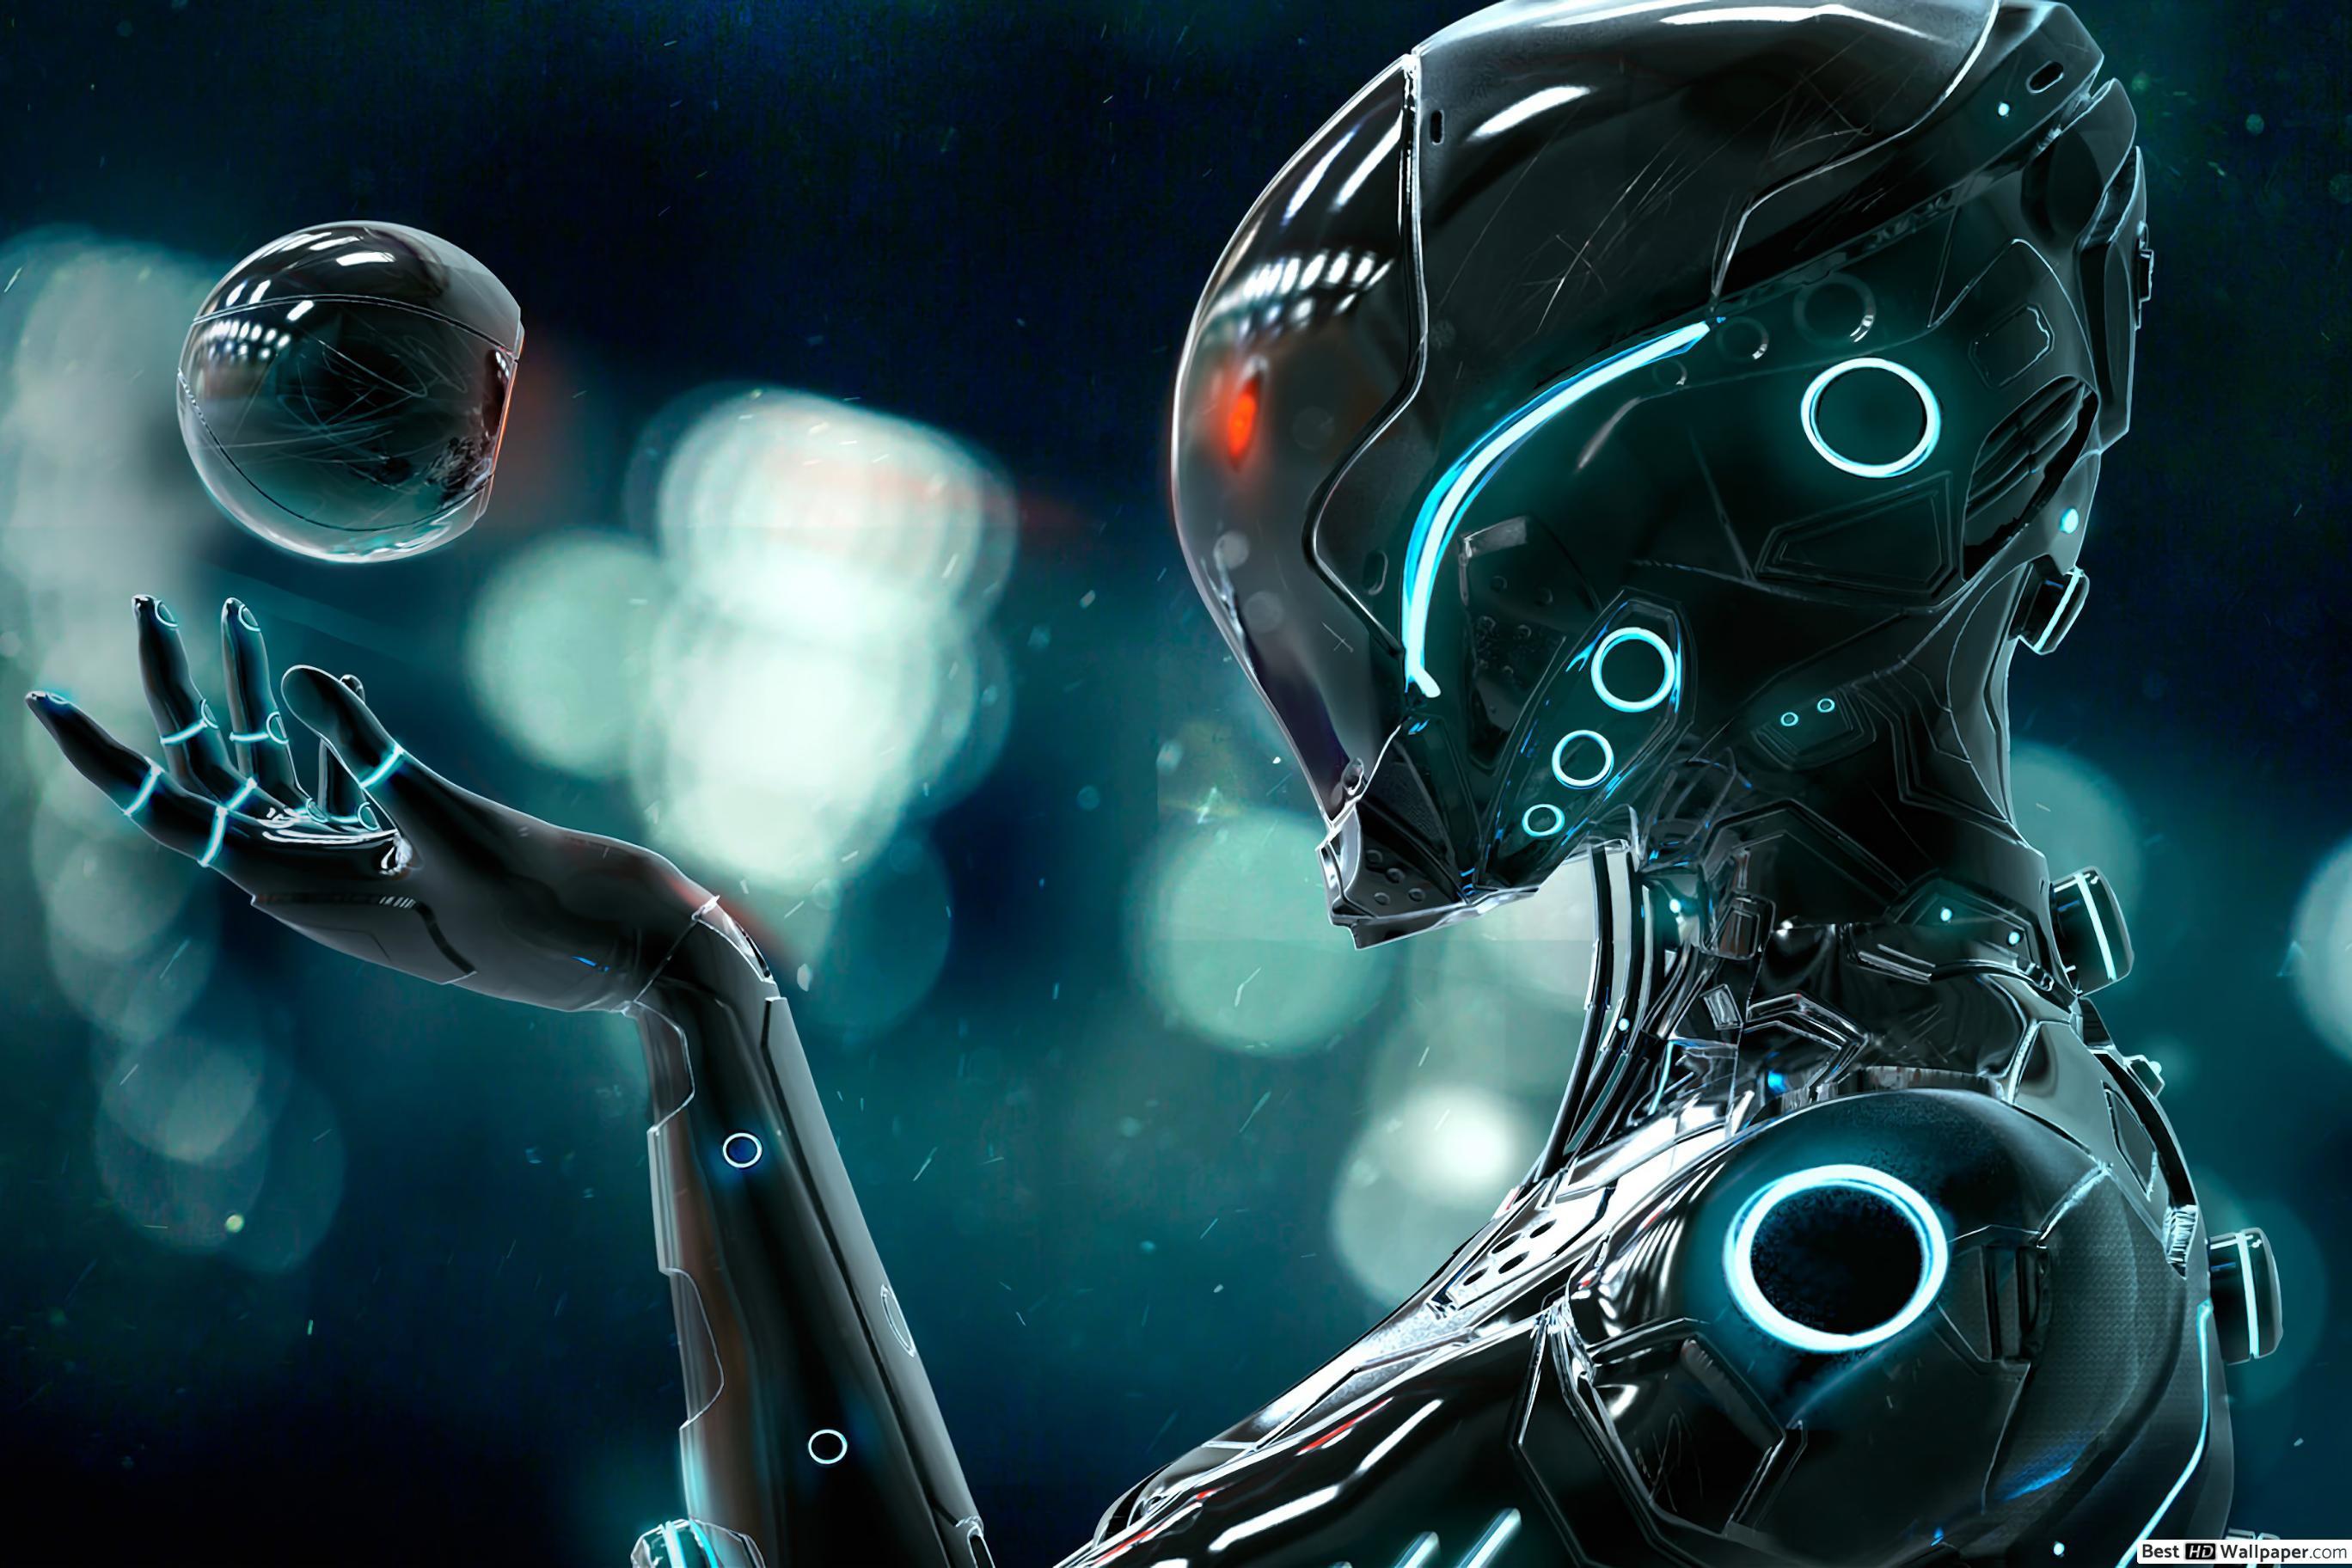 Future Robot Wallpapers   Top Future Robot Backgrounds 2736x1824